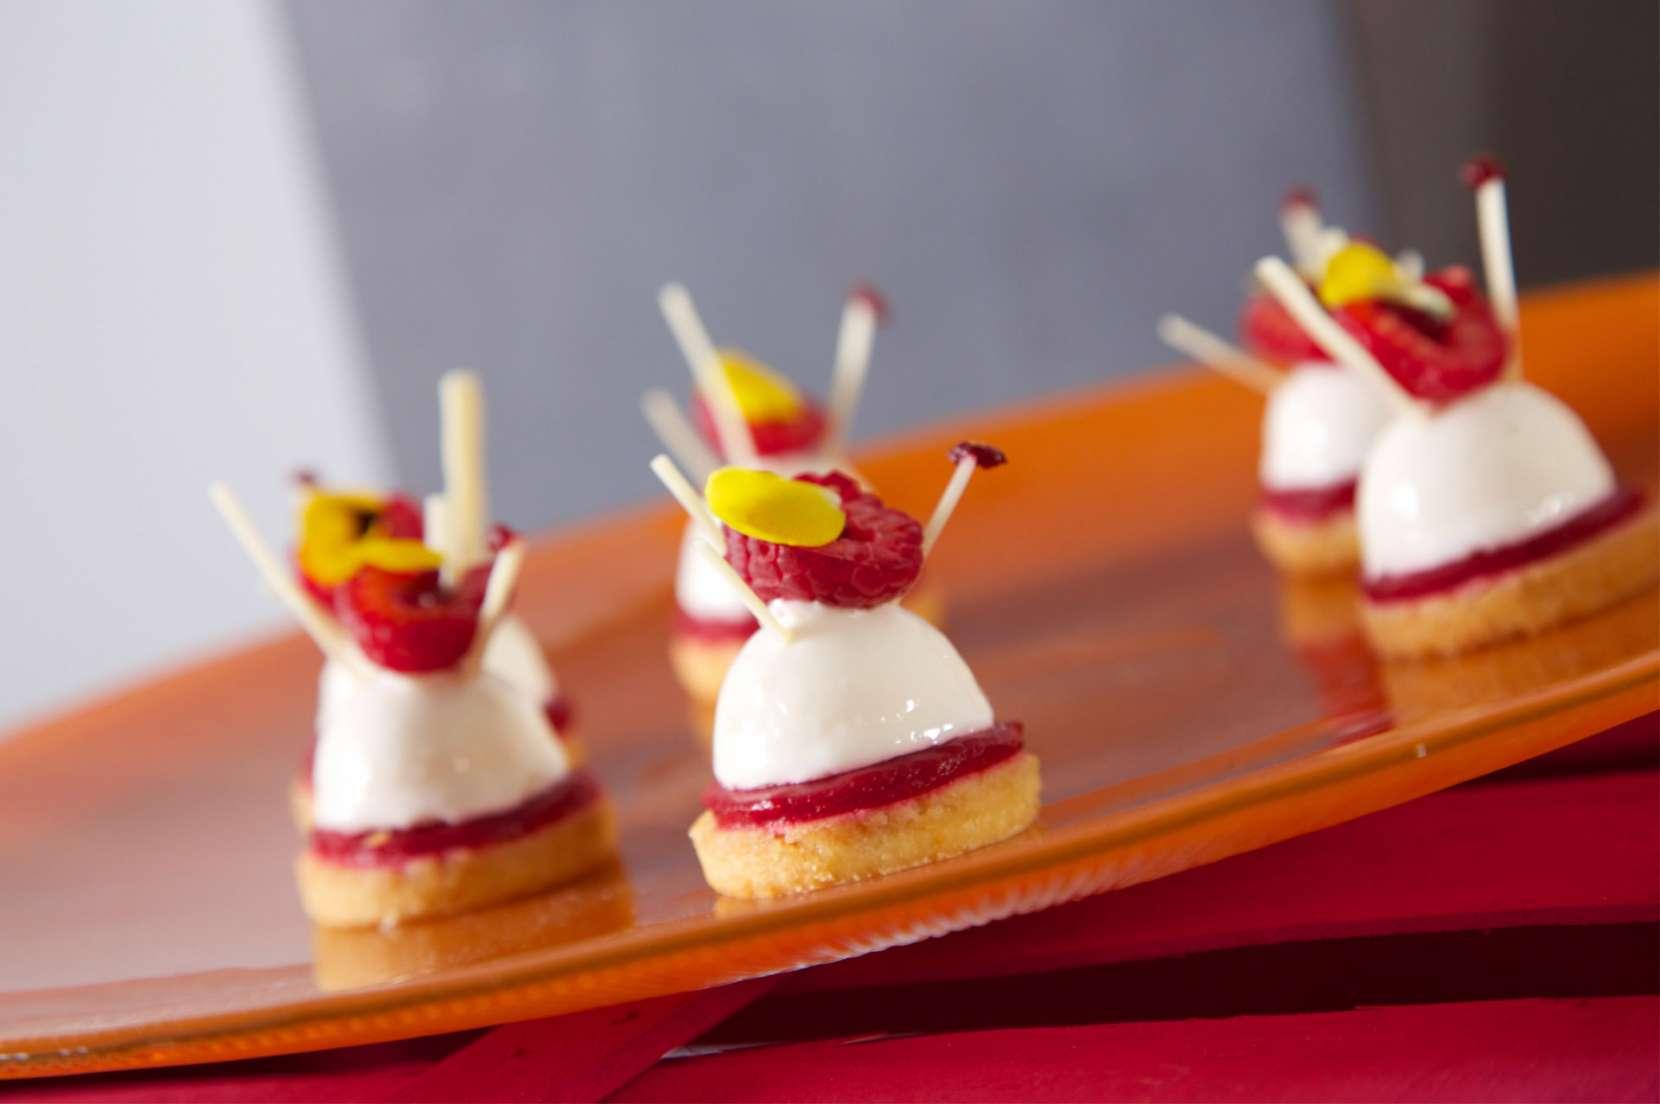 Pièce-cocktail-sucrée-1660x1104.jpg